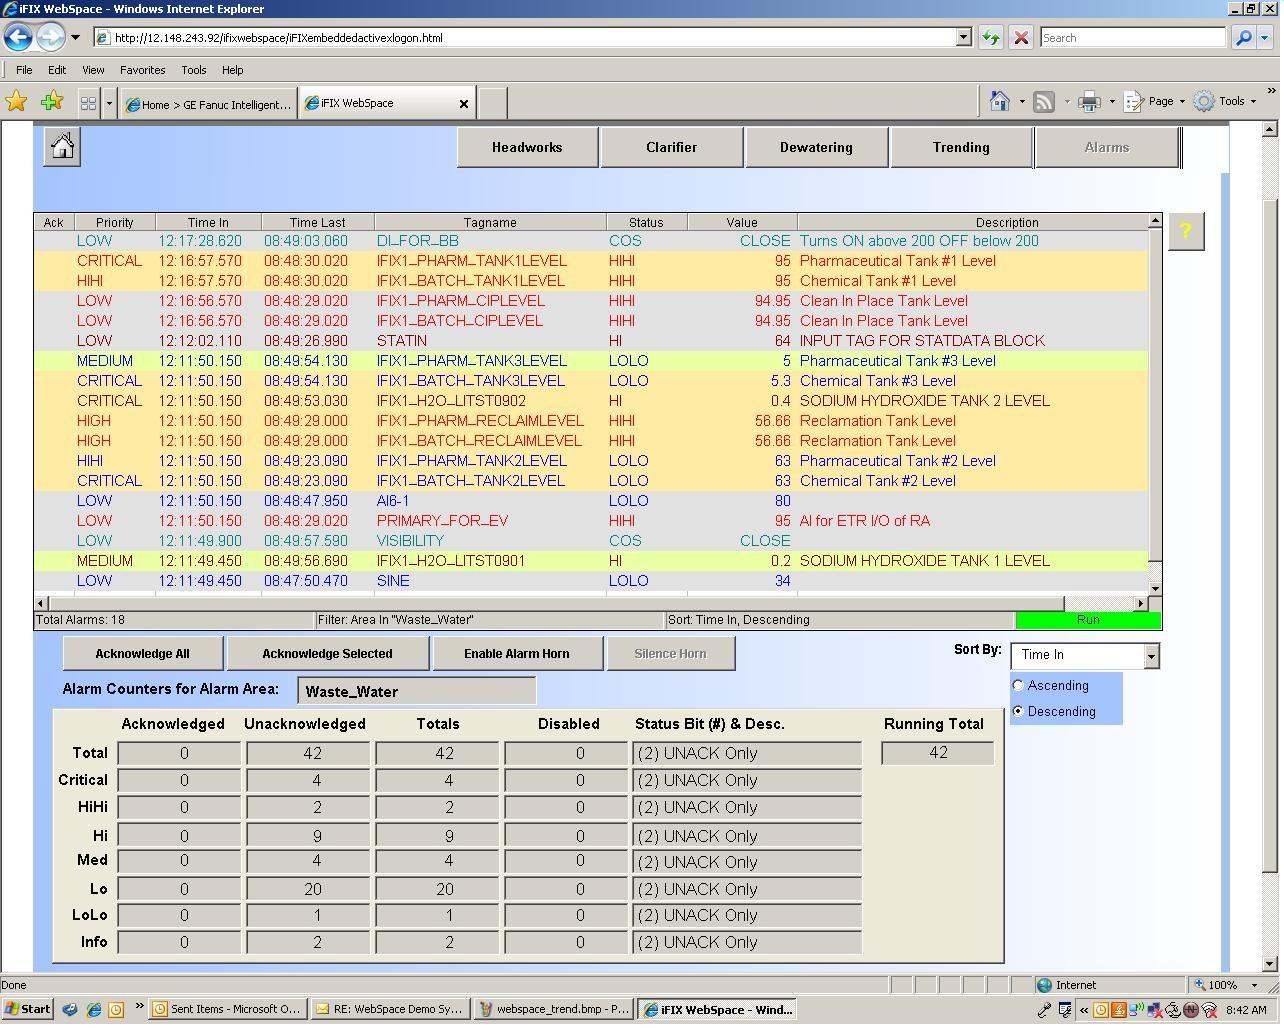 GE Fanuc Intelligent Platforms Announces Proficy® HMI/SCADA - iFIX